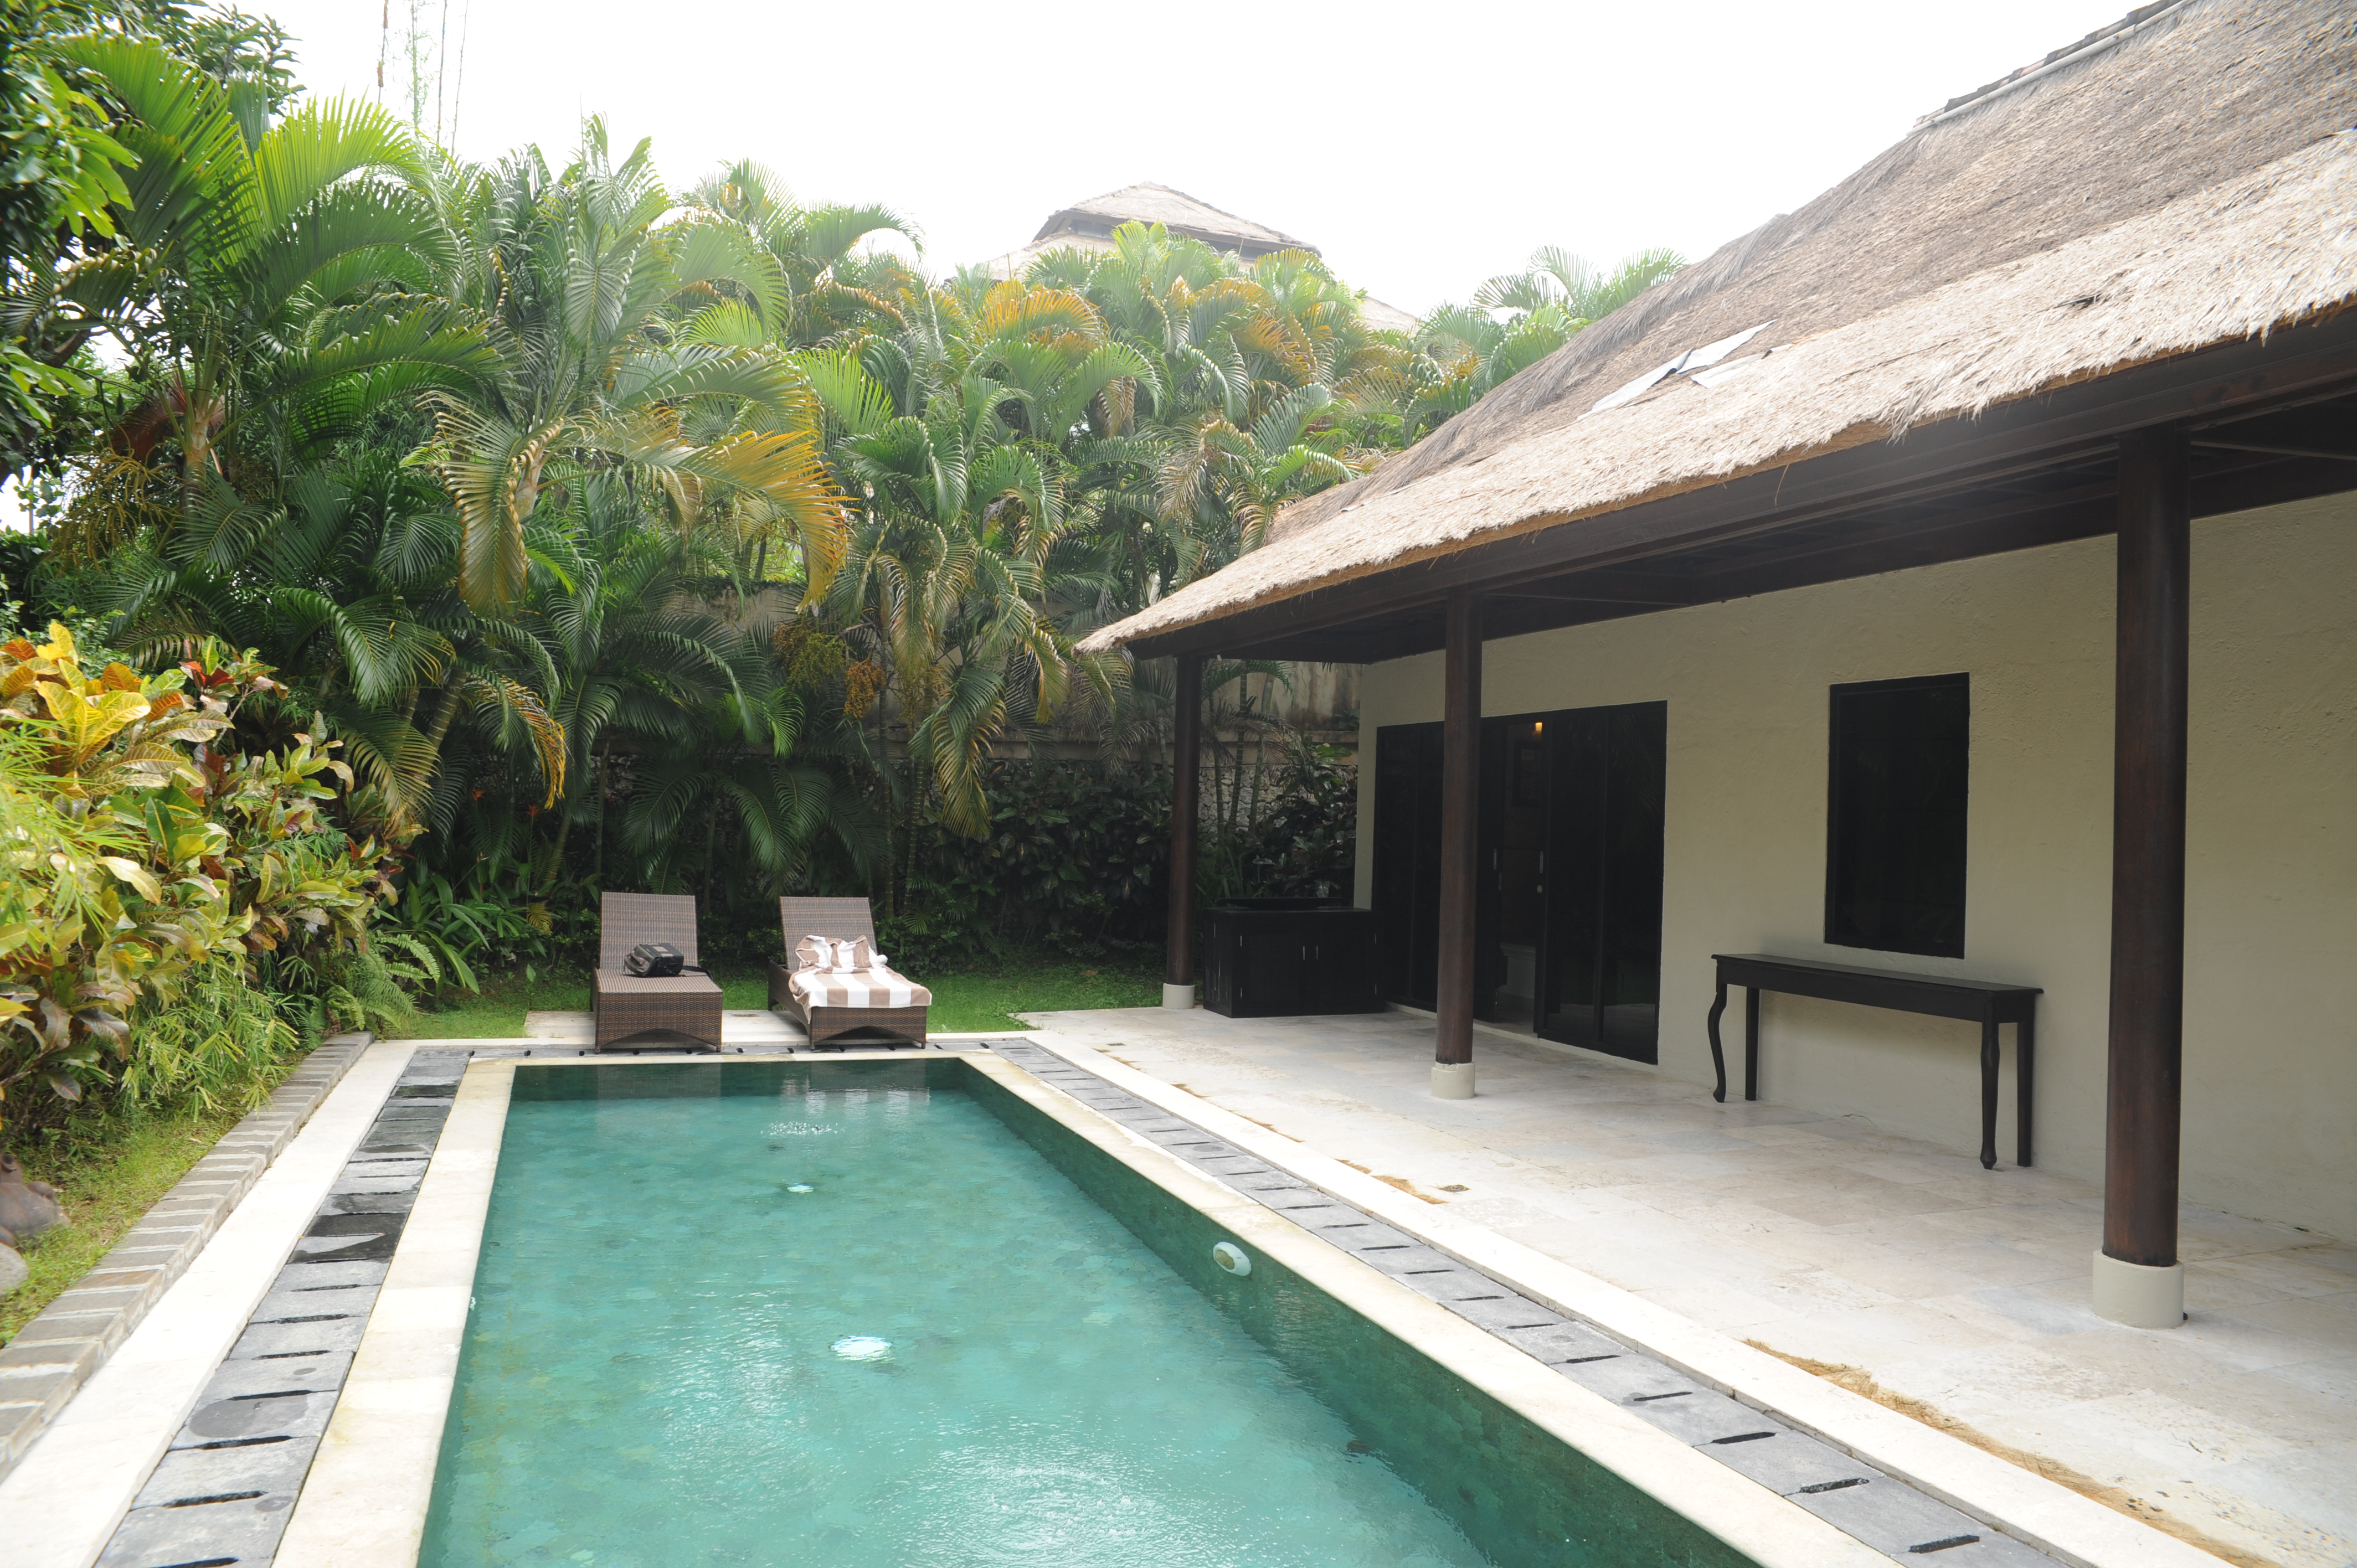 bali(巴厘岛梦境别墅酒店